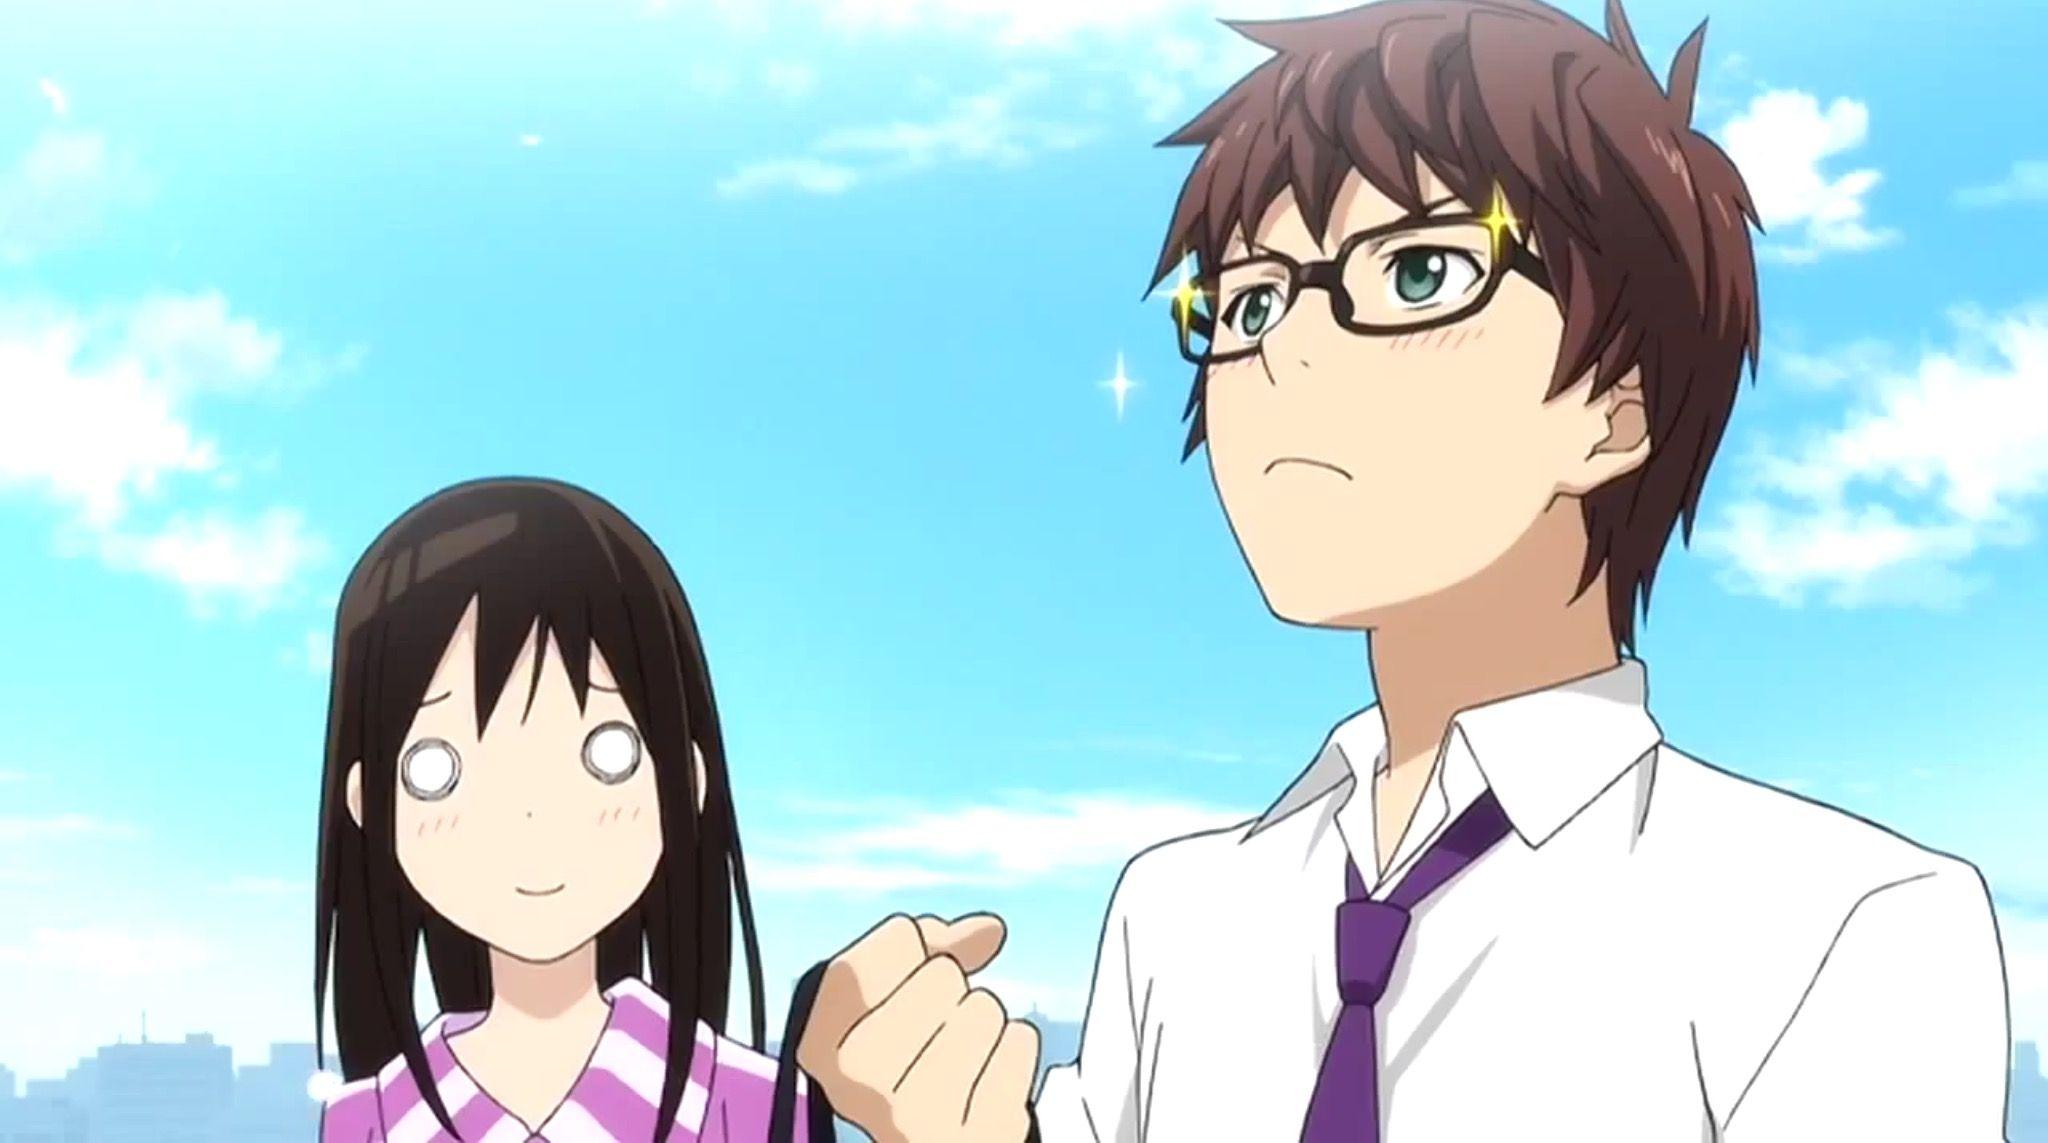 Lol looks like Kazuma is dreaming about making Bishamon